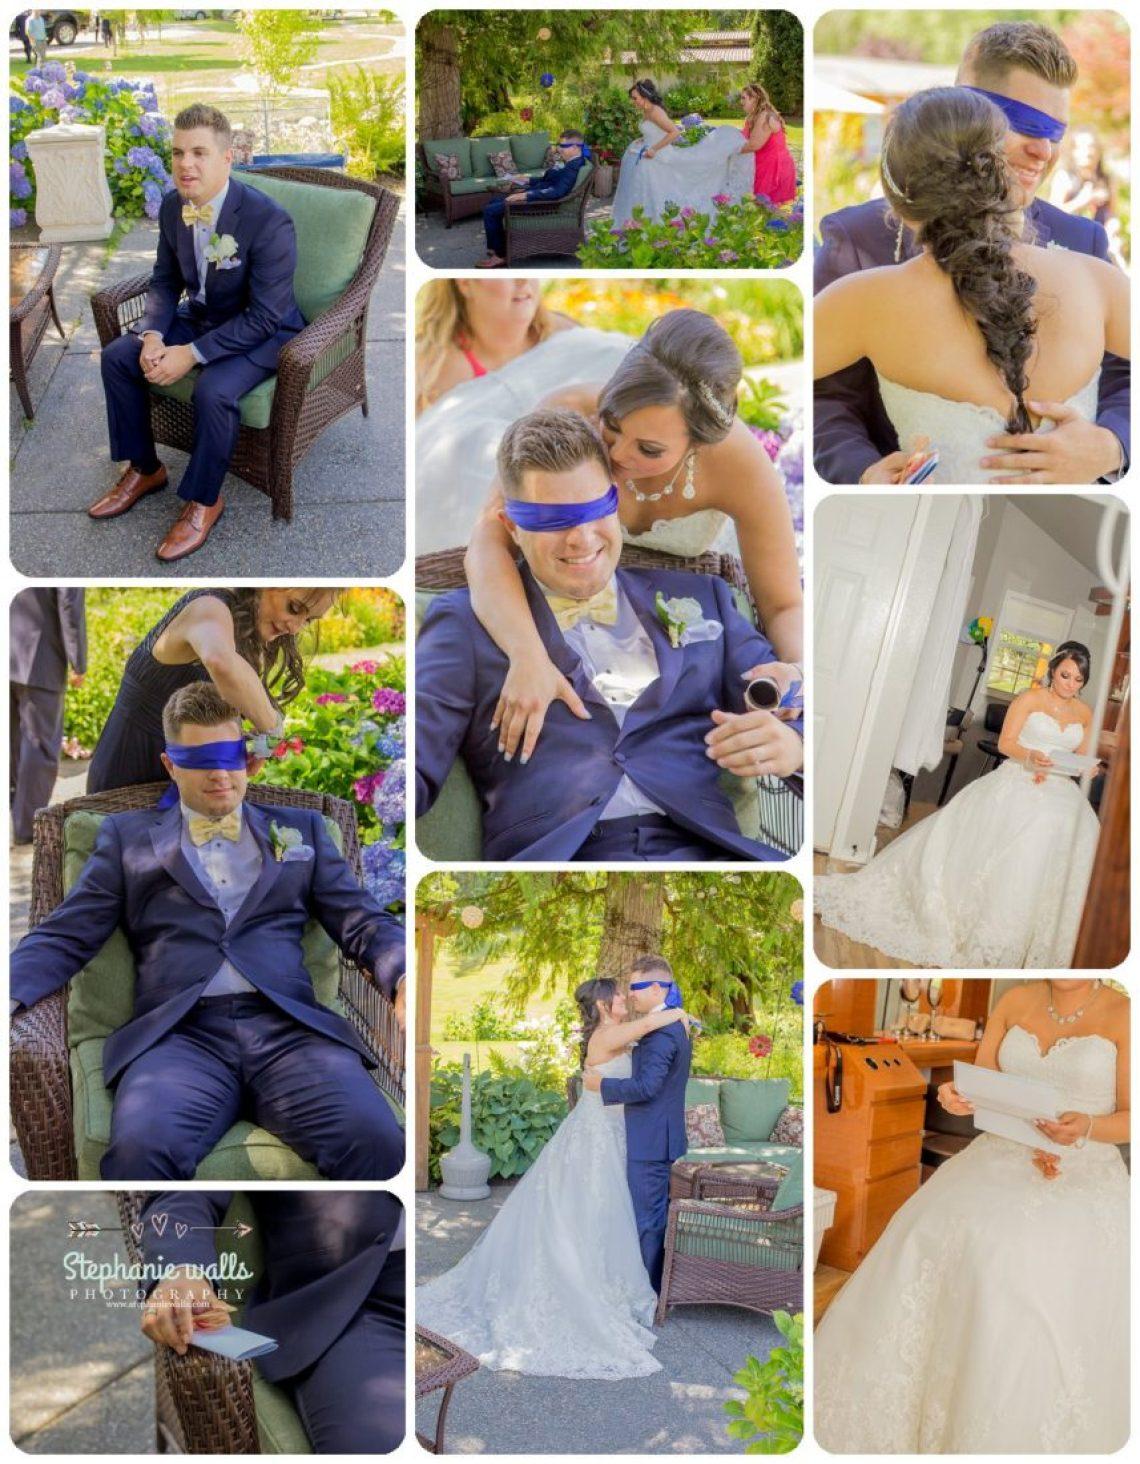 2016 11 29 0009 This Day Forward   Wild Rose Weddings Arlington, Washington